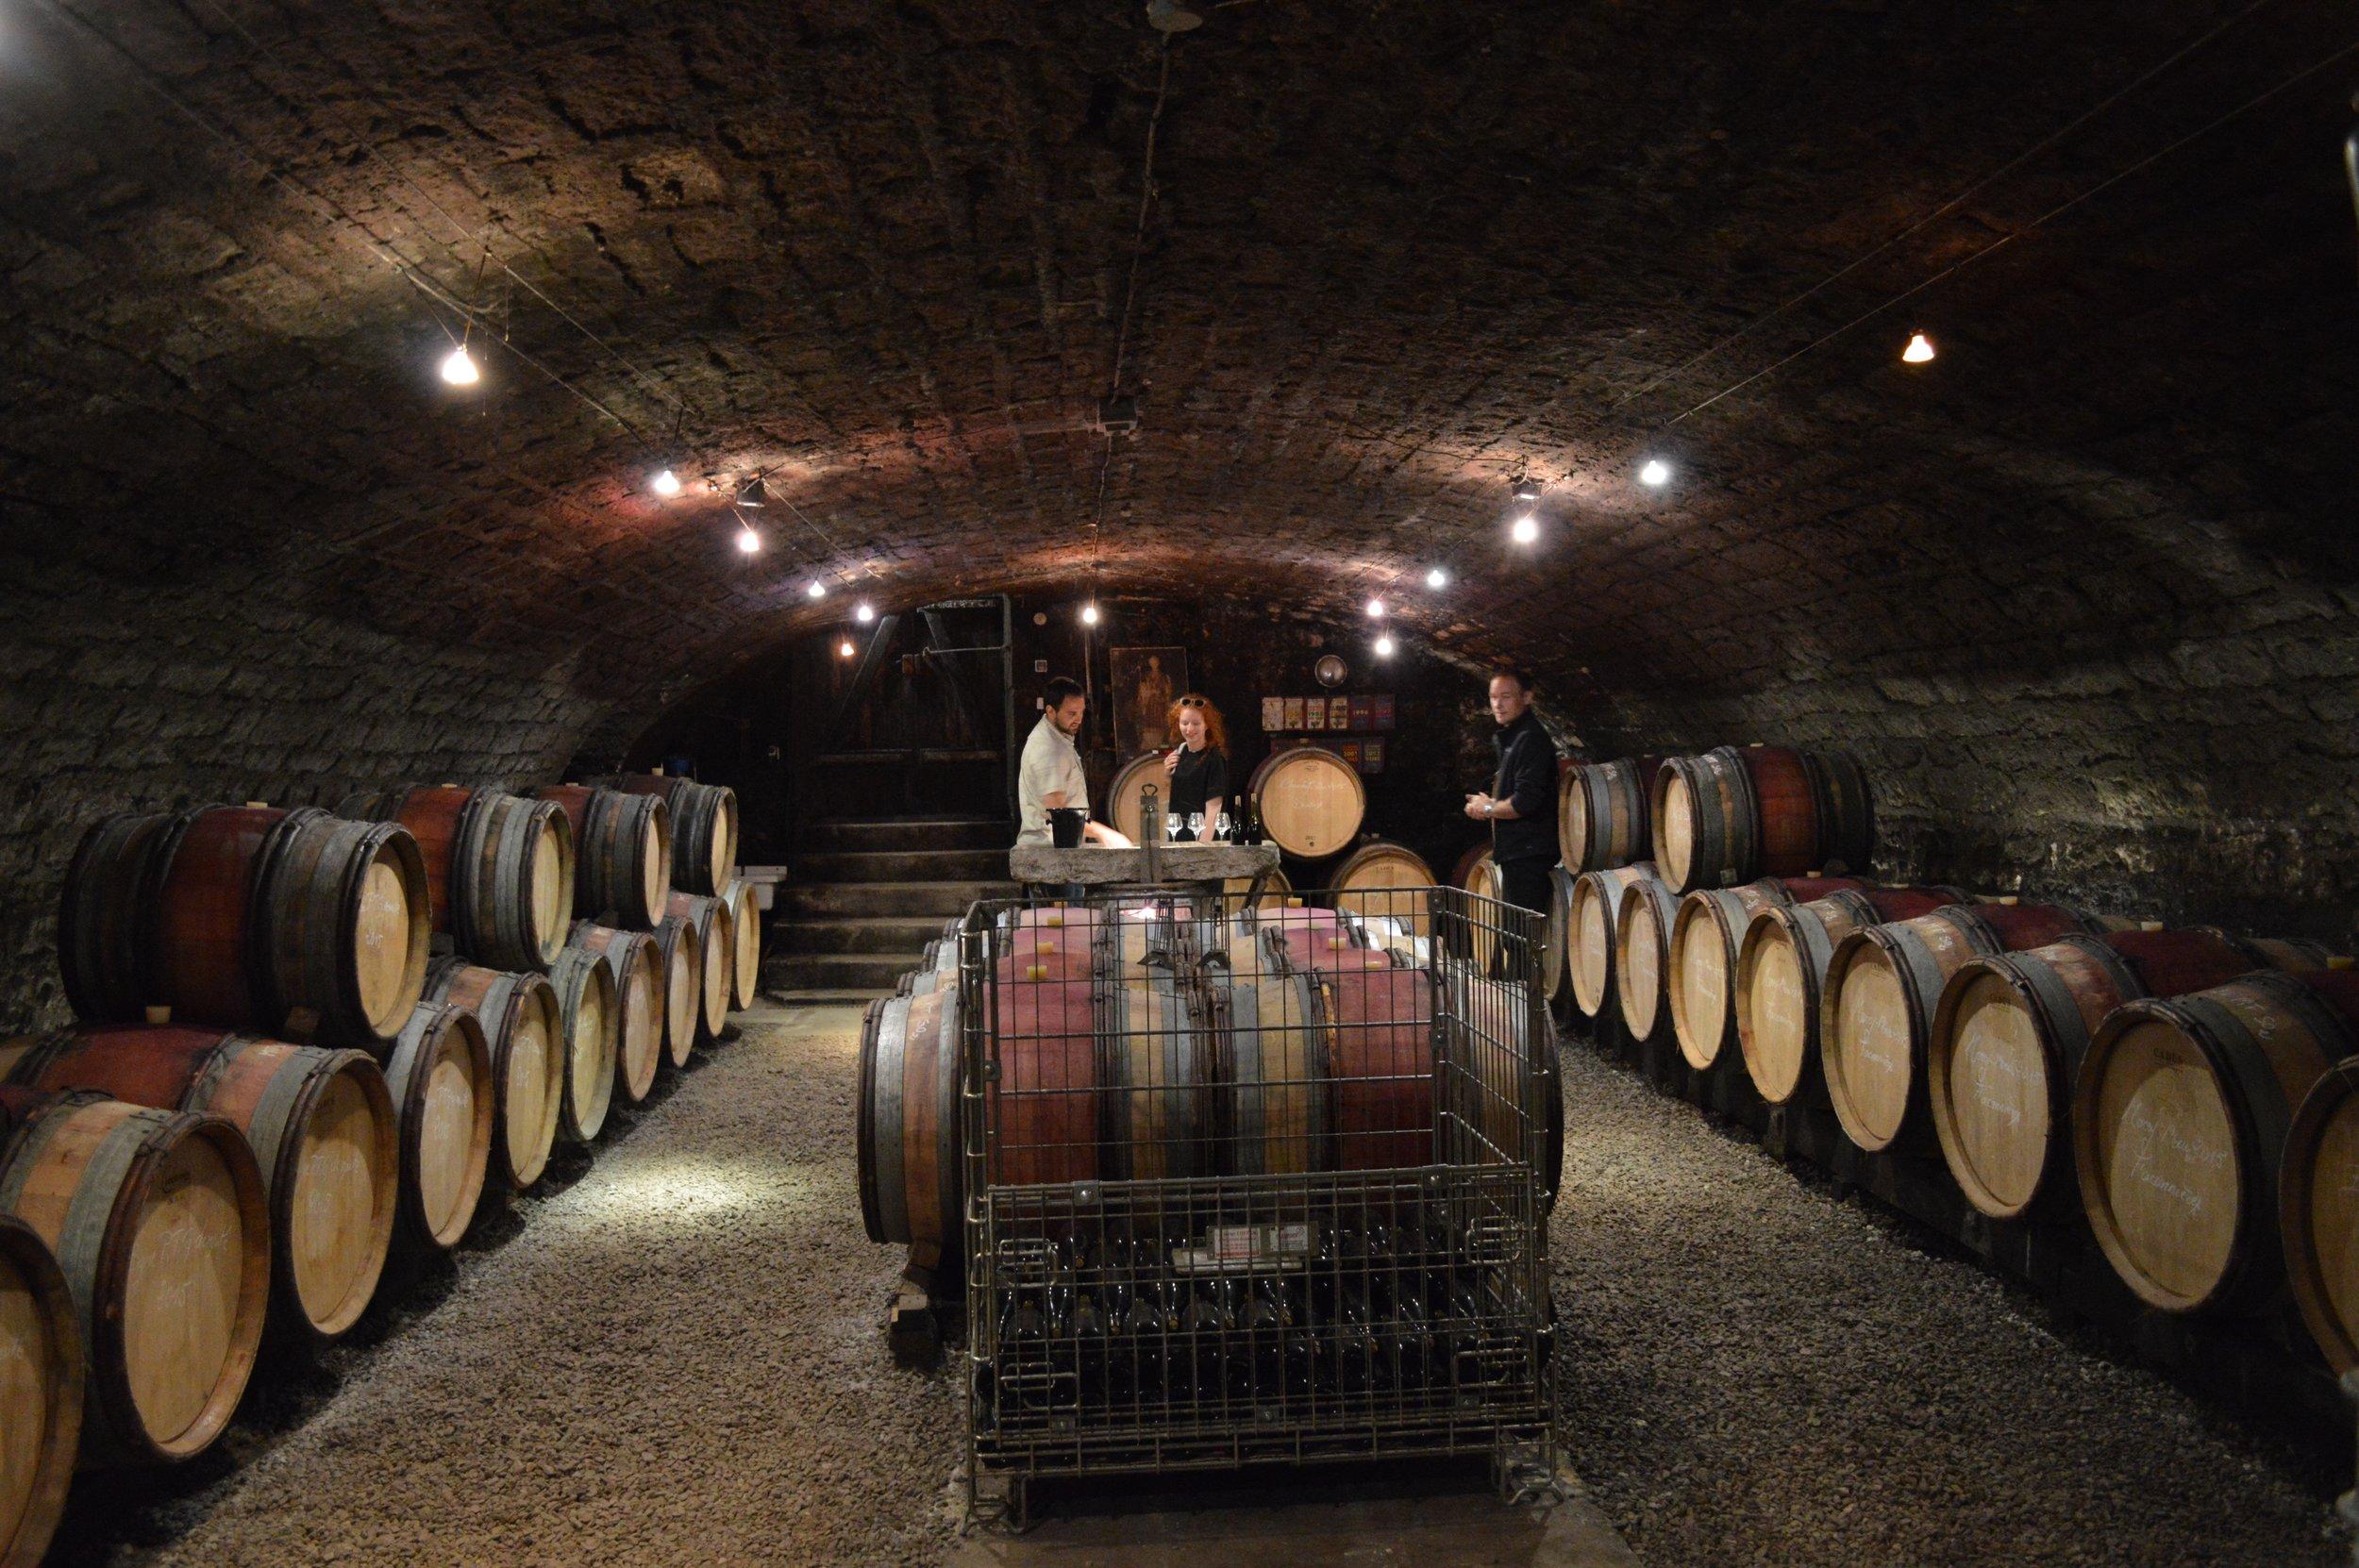 The cellar of Stephane Magnien in Morey-Saint-Denis.